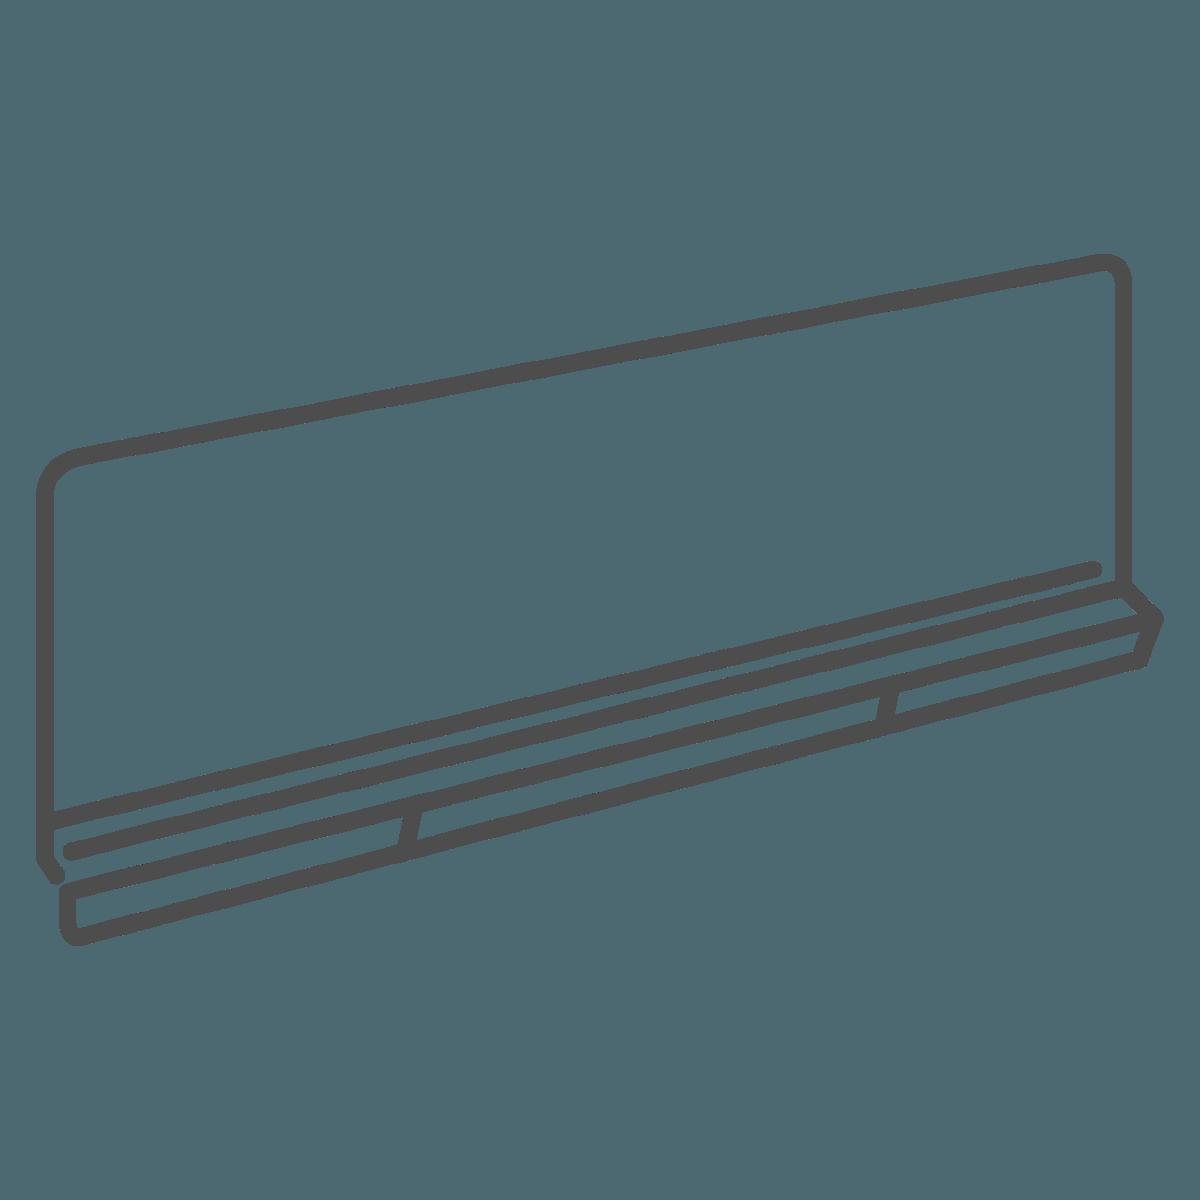 Notestands